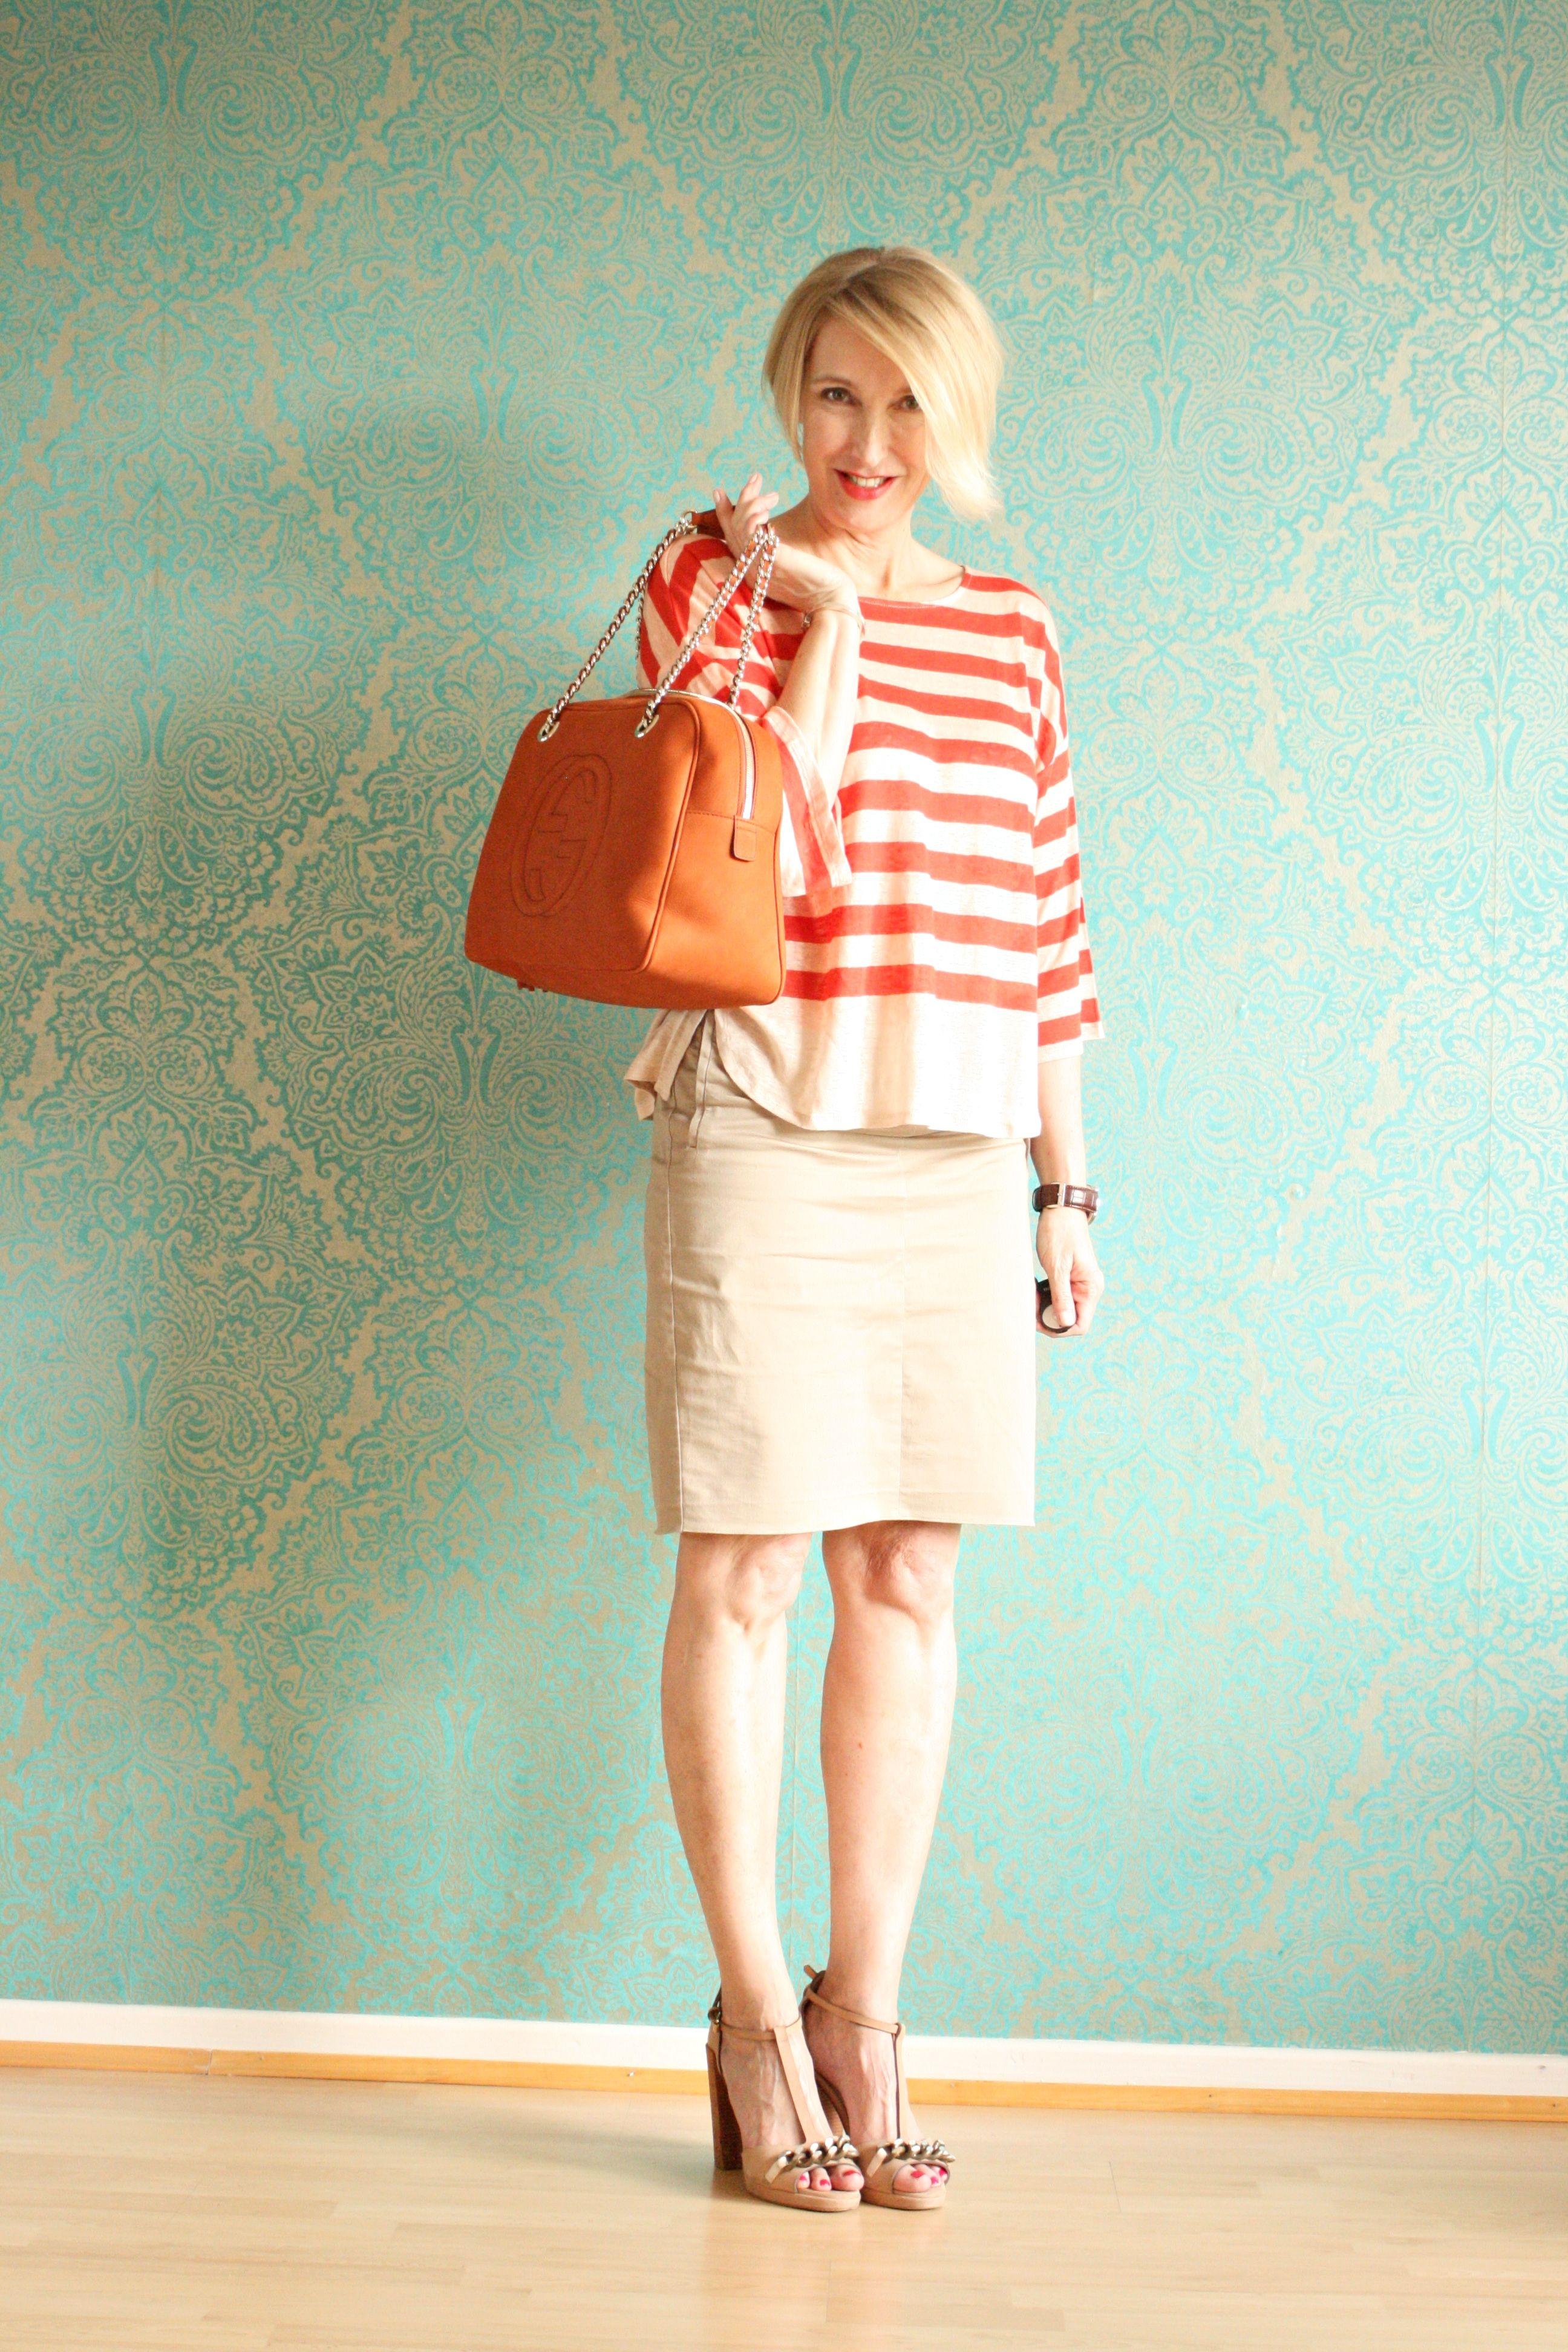 A fashion blog for women over 40 and mature women Shirt: HOSS Indropia Skirt. Zara Bag: Gucci Sandals: Dorothee Schumacher  http://www.glamupyourlifestyle.com/